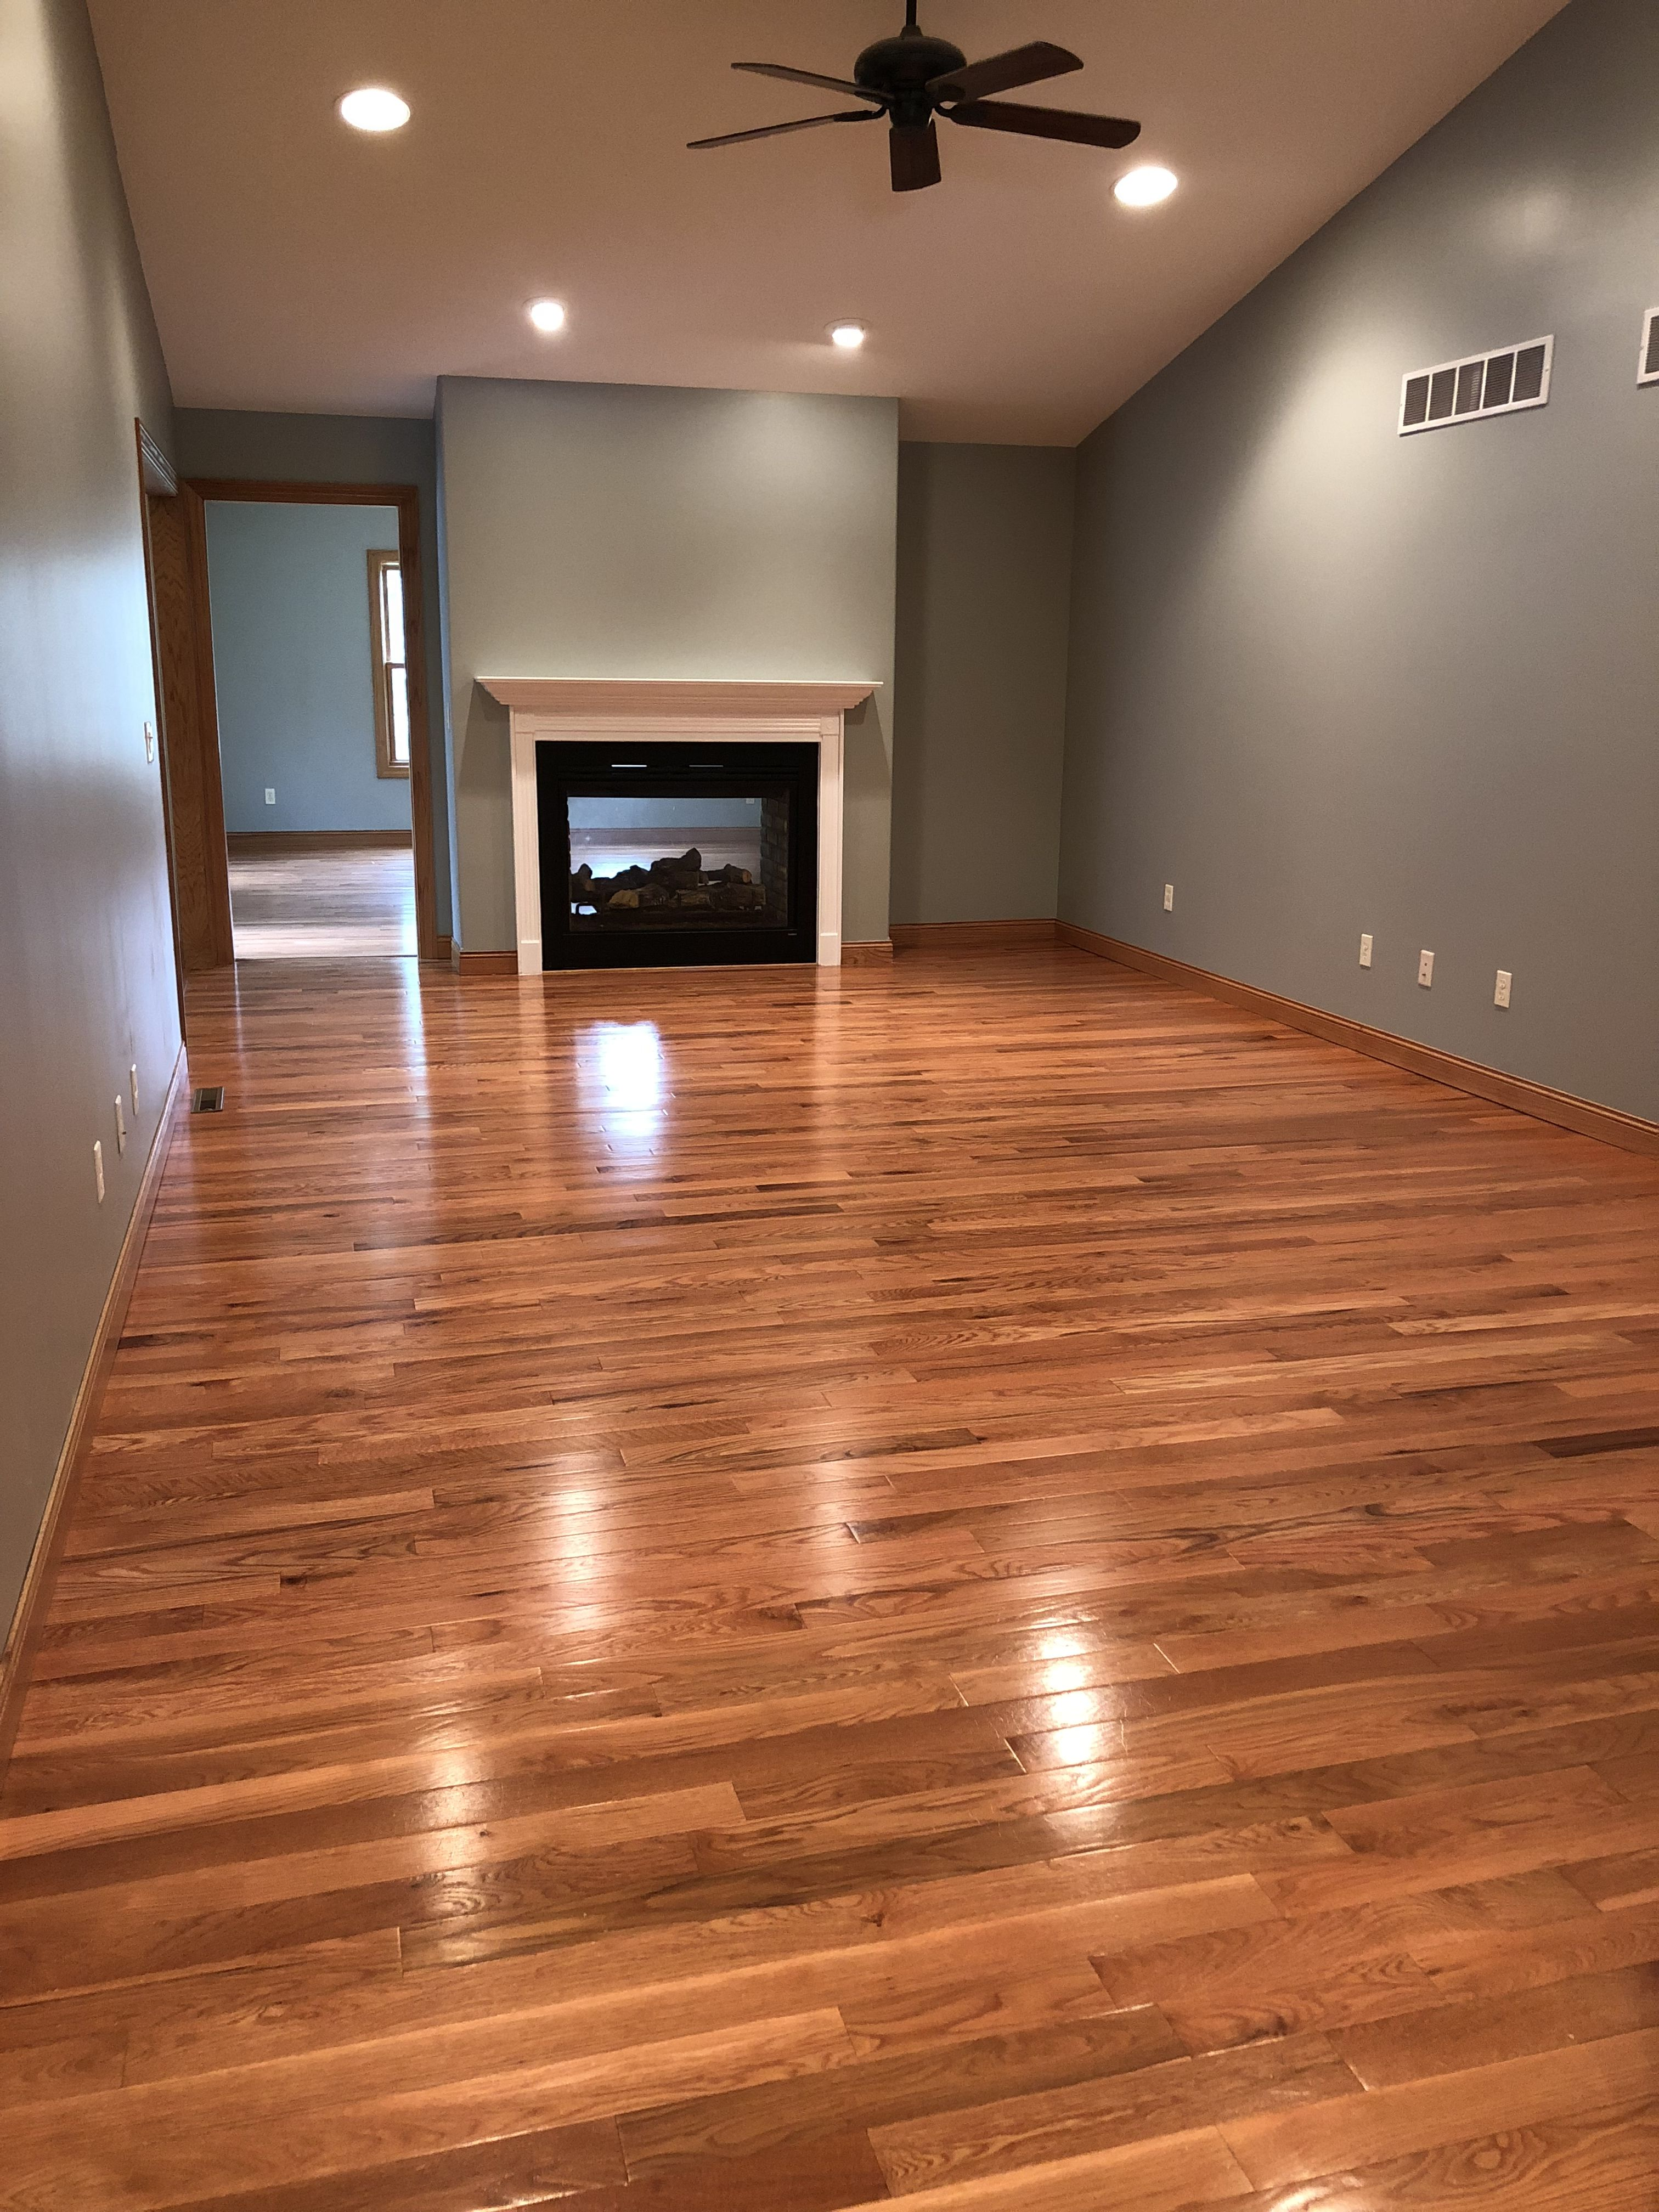 Behr Weathered Moss Honey Oak hardwood floors. Hardwood